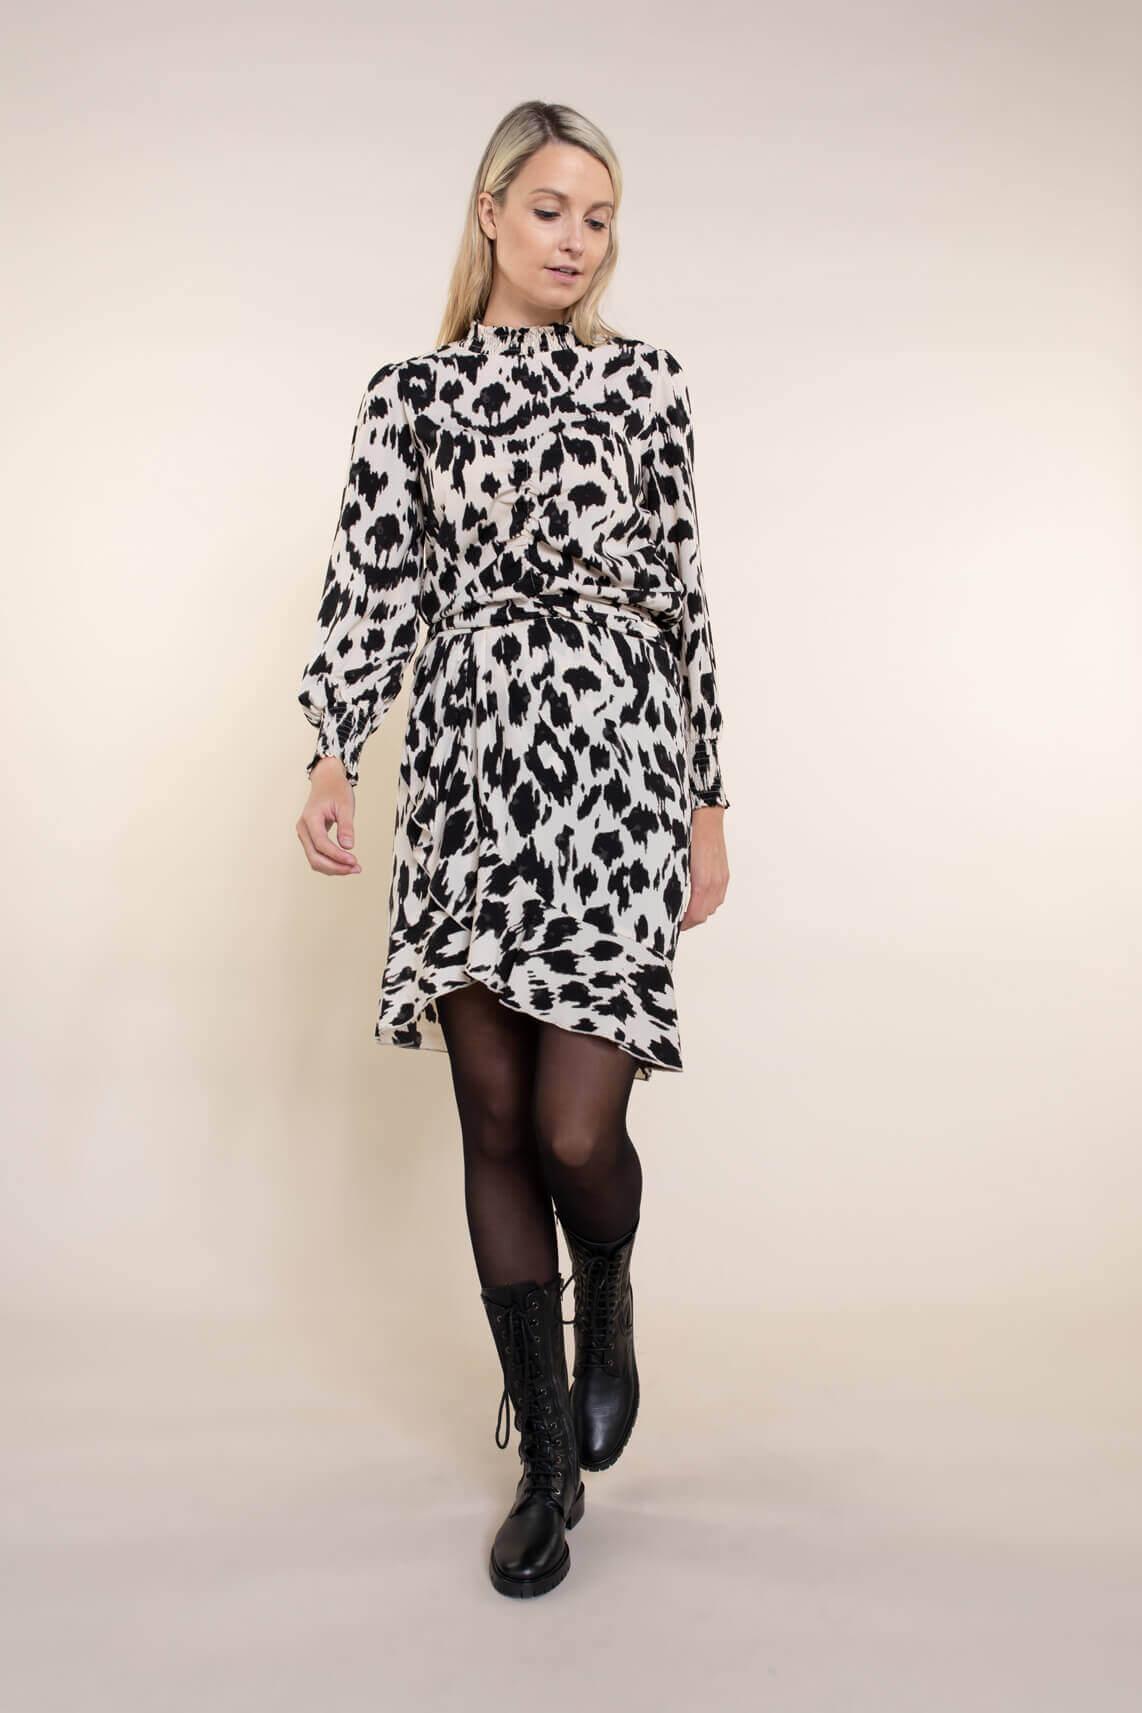 Co Couture Dames Rok met ruches zwart